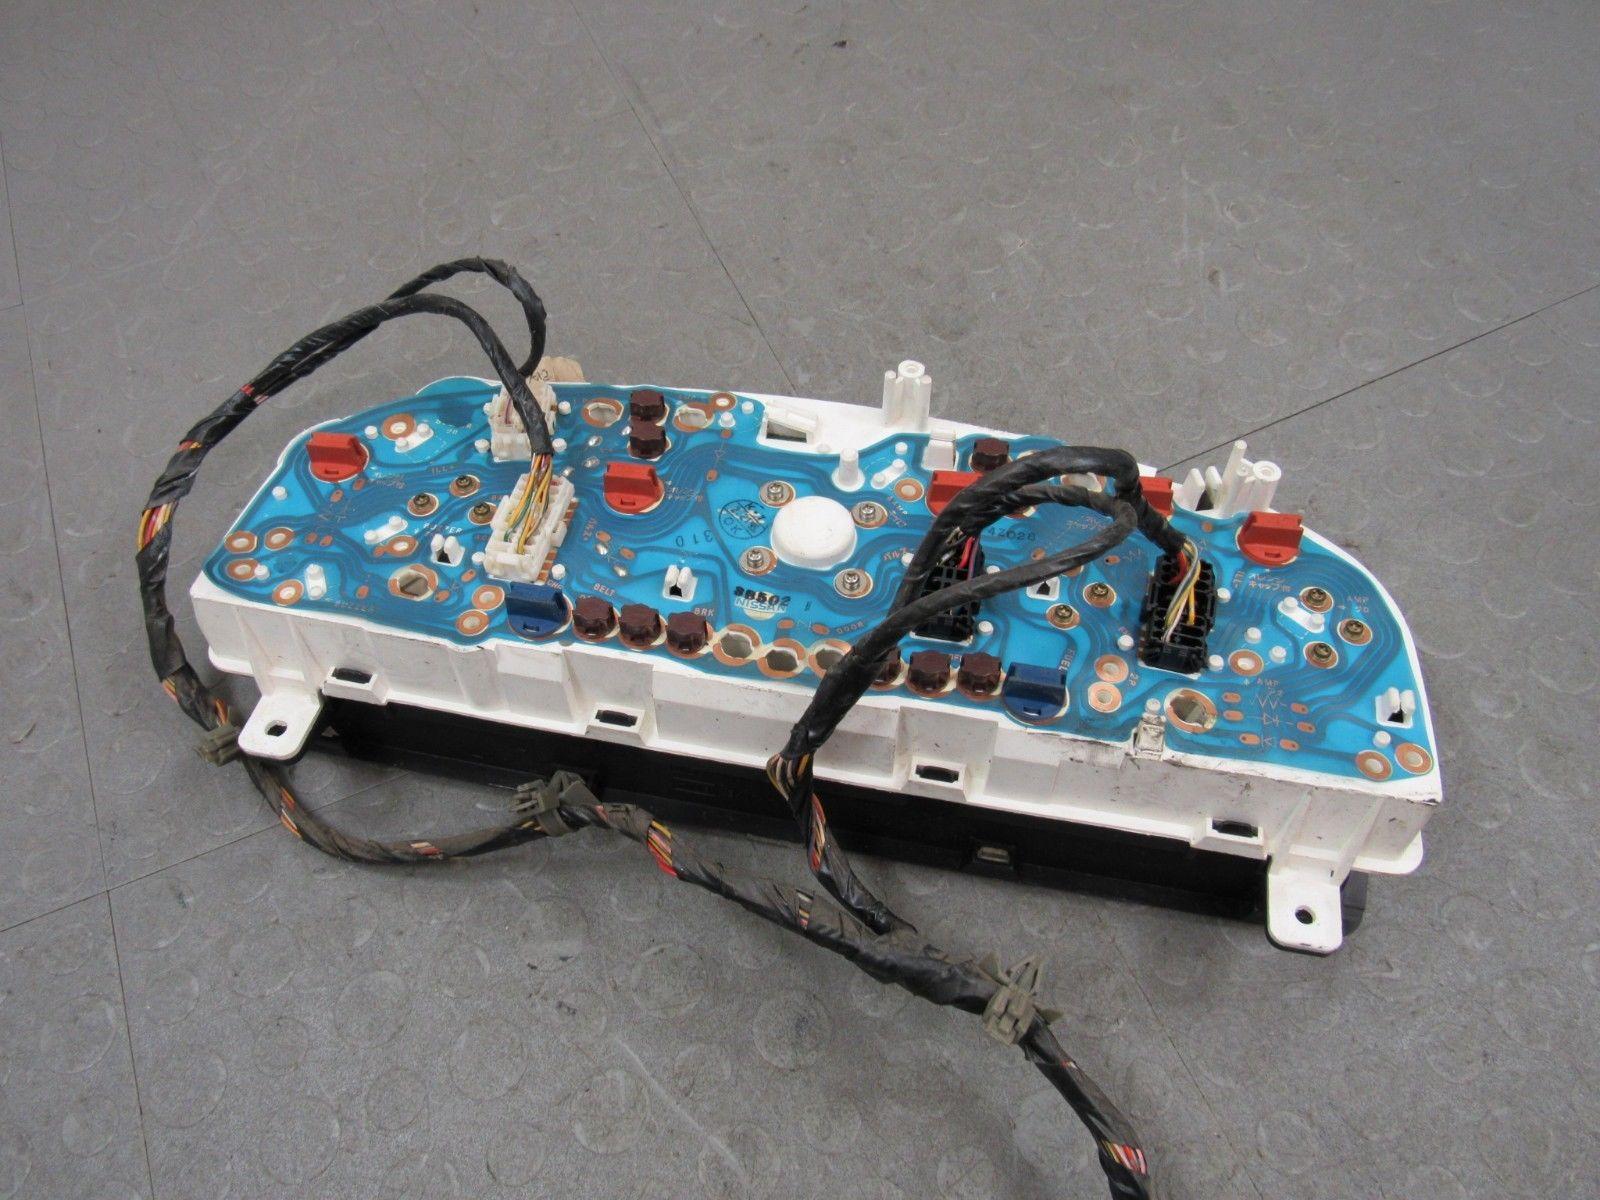 94 97 Nissan Pickup Truck Hard Body Instrument Gauge Cluster Tach Wiring Harness 220227